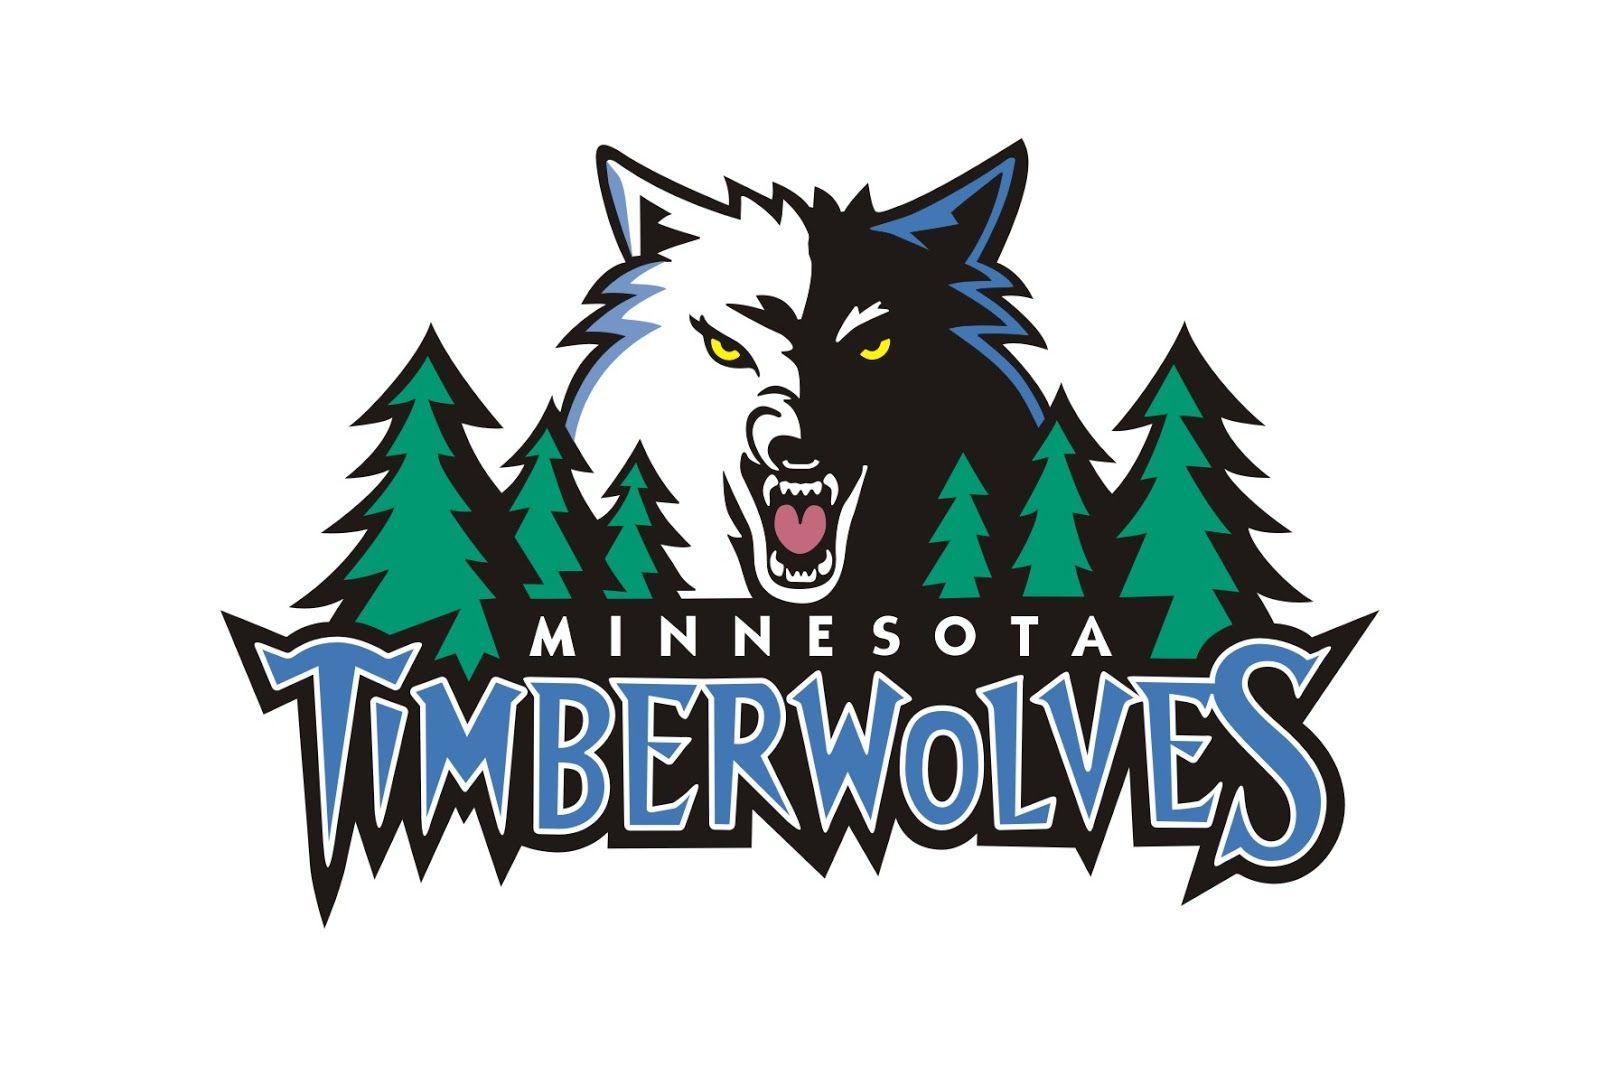 images of the MINNESOTA timberwolves football team logos